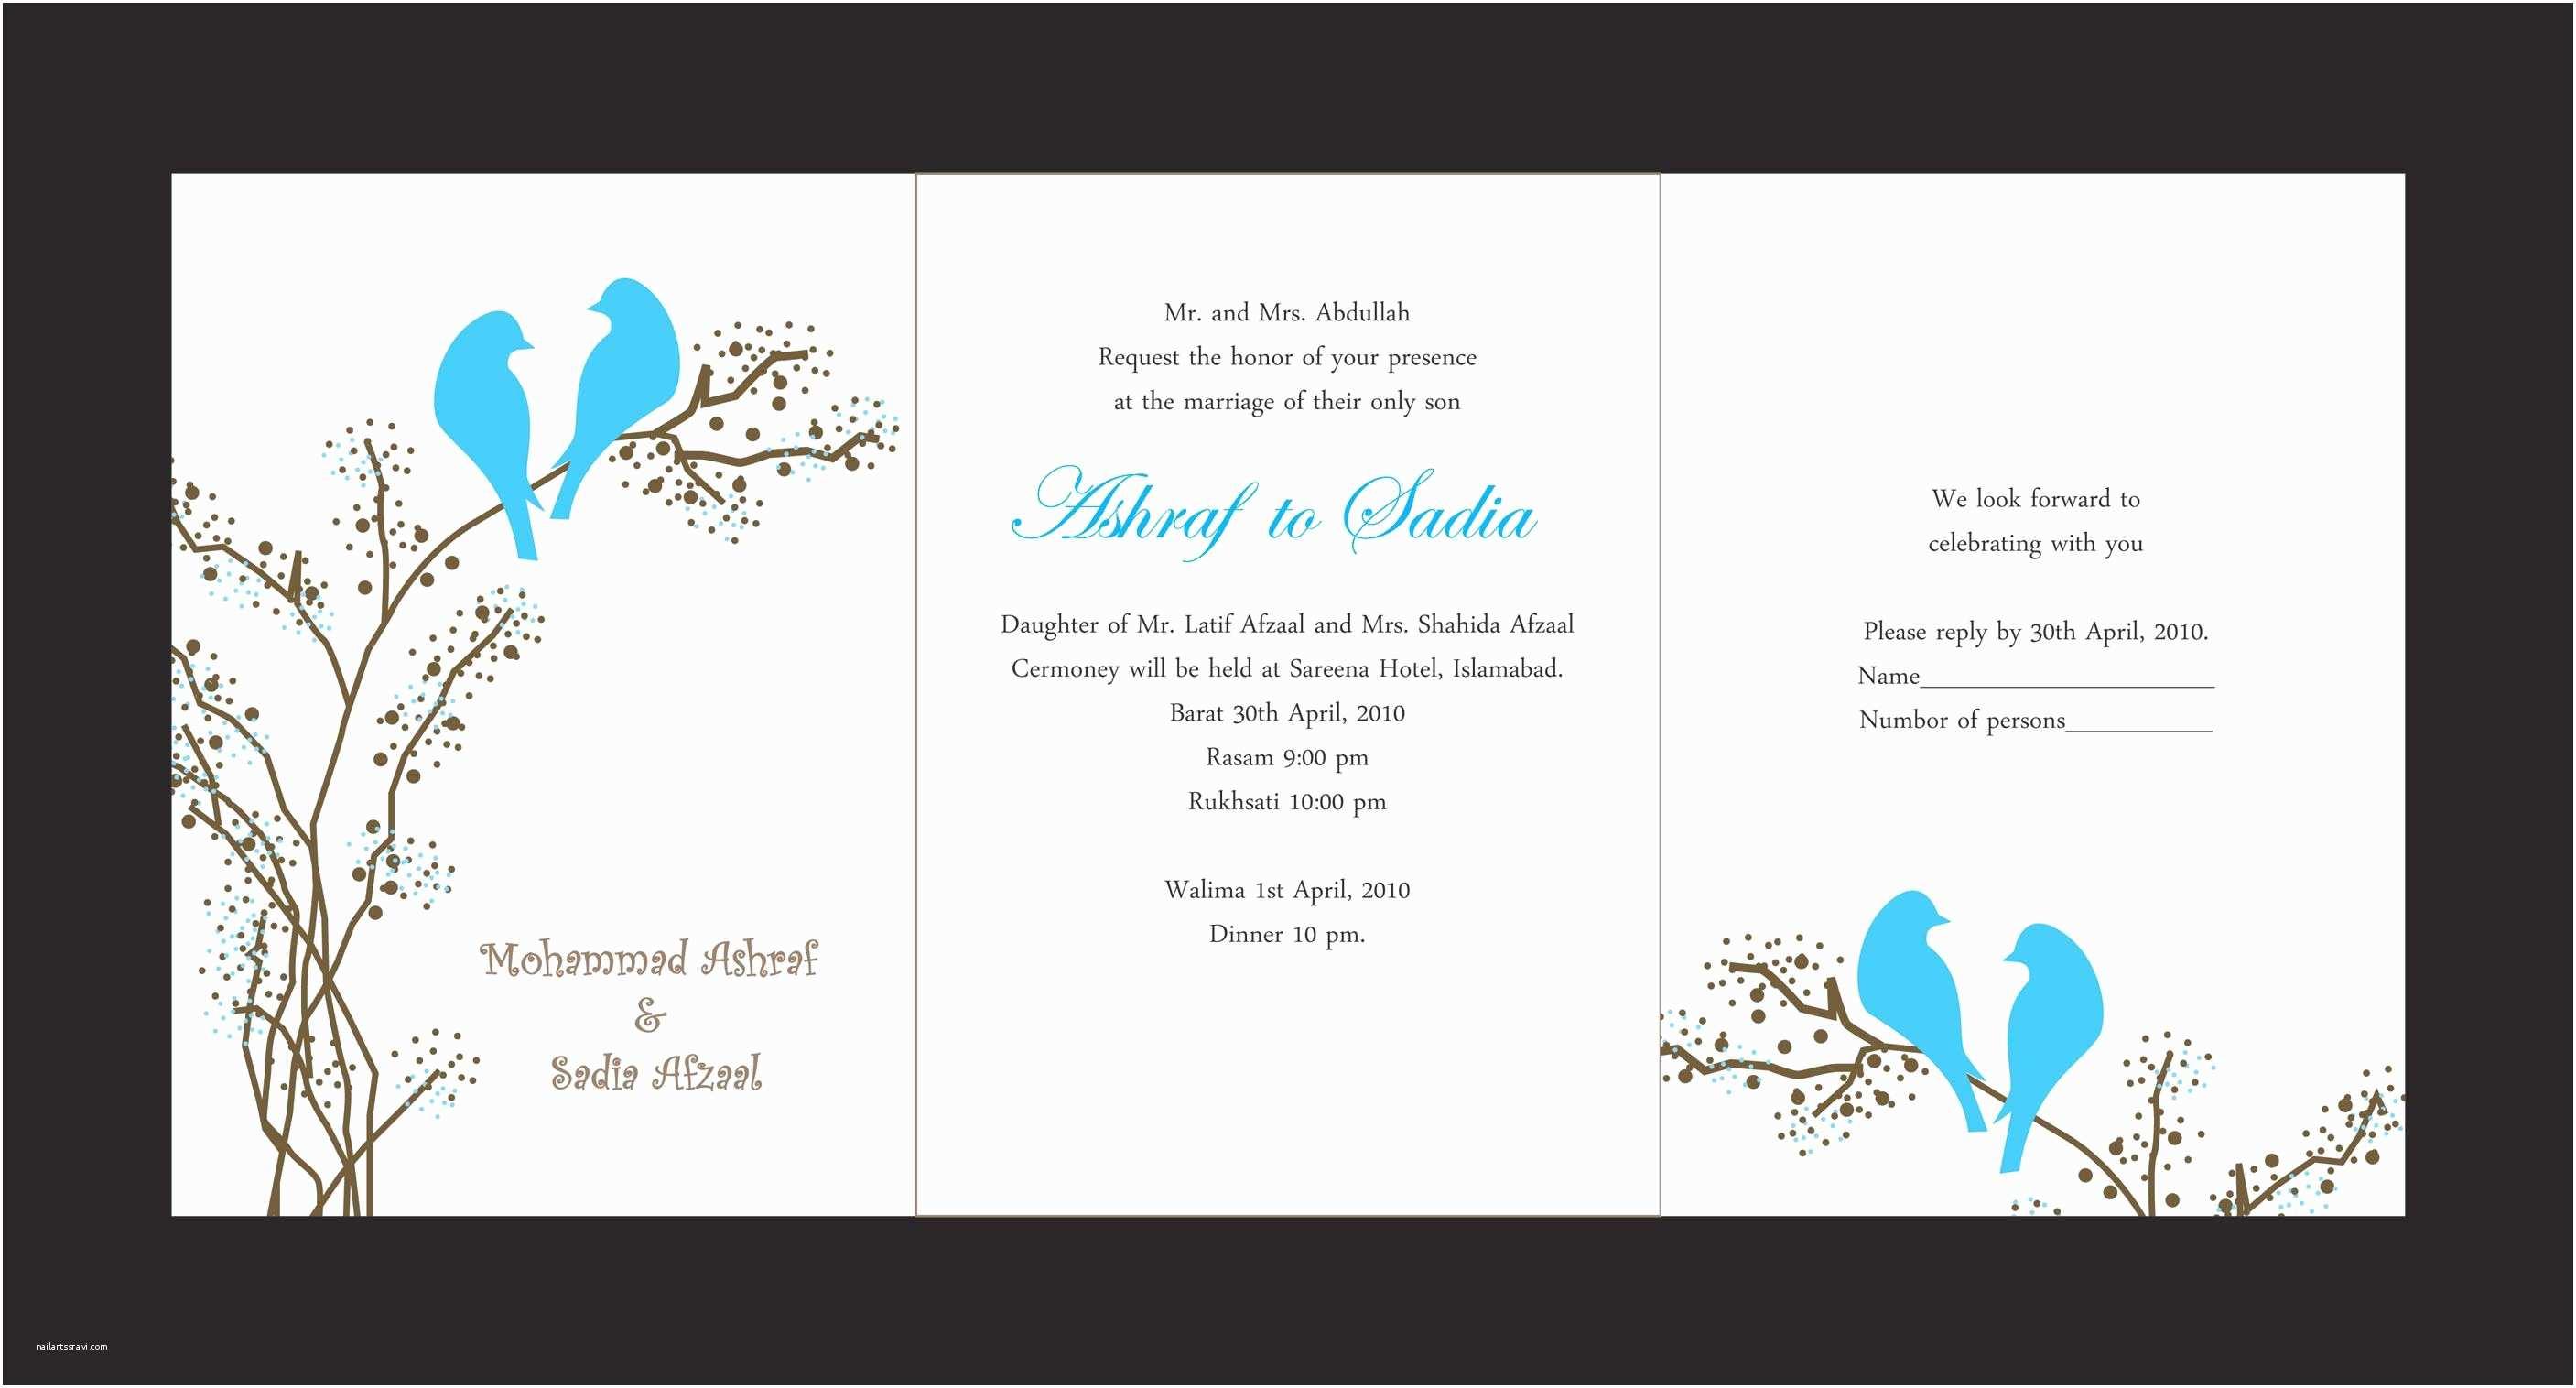 Nicest Wedding Invitations Best Invitation Cards Unique Wedding Invitation Card